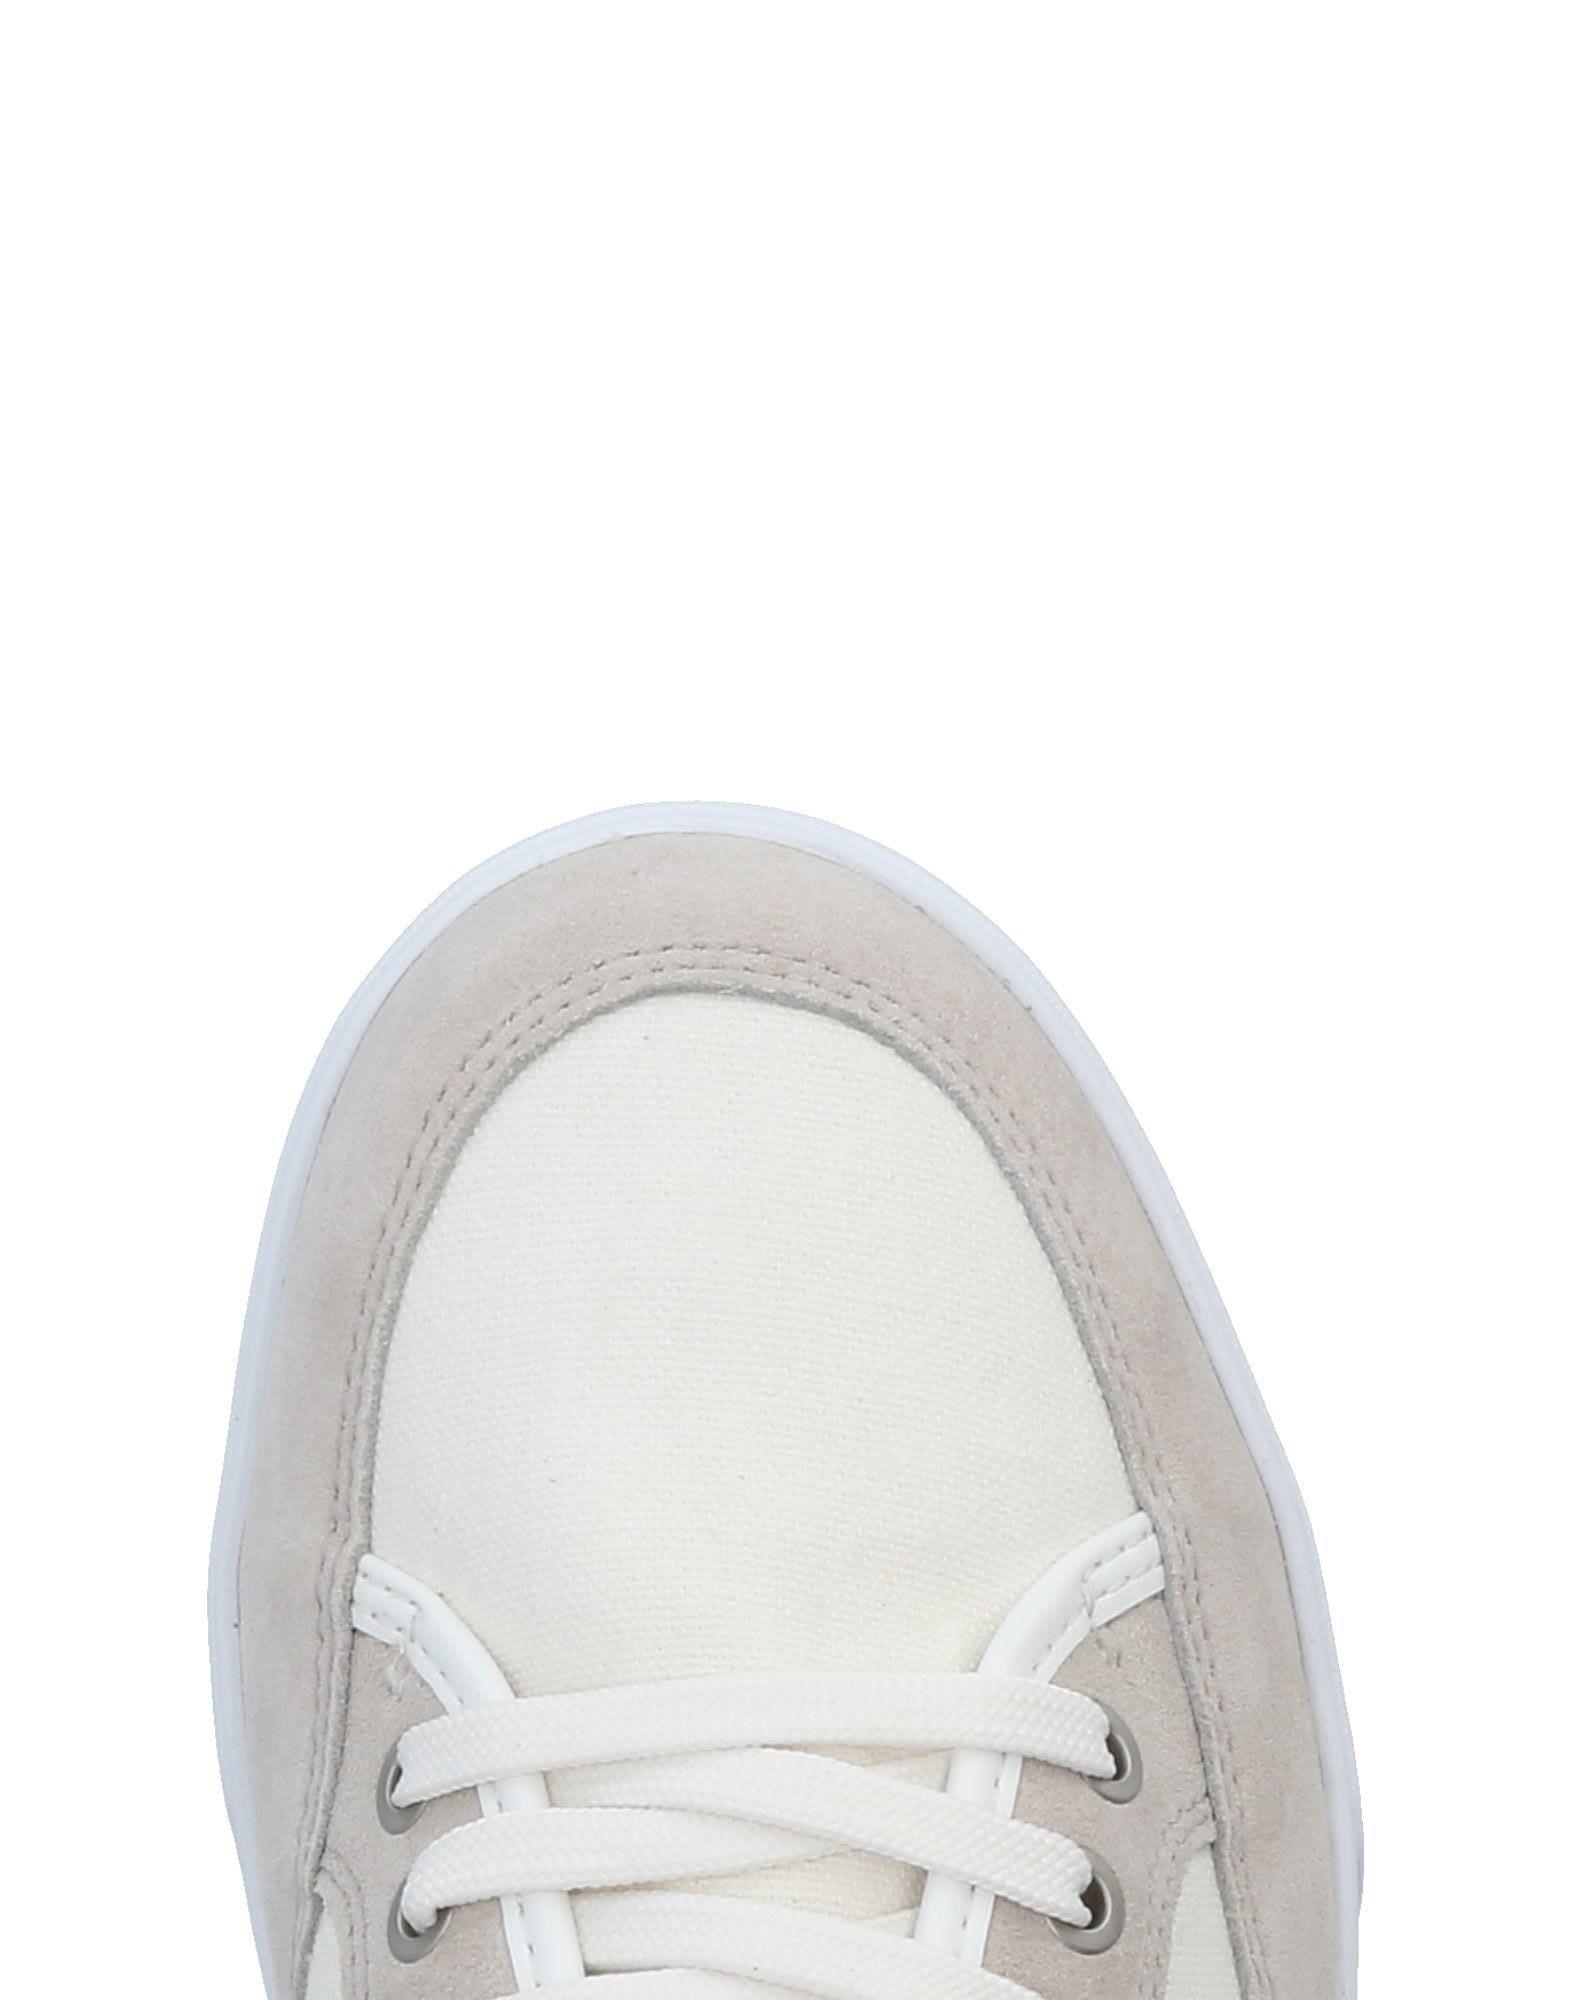 Geox Sneakers Herren Heiße  11217753WE Heiße Herren Schuhe e15a9f